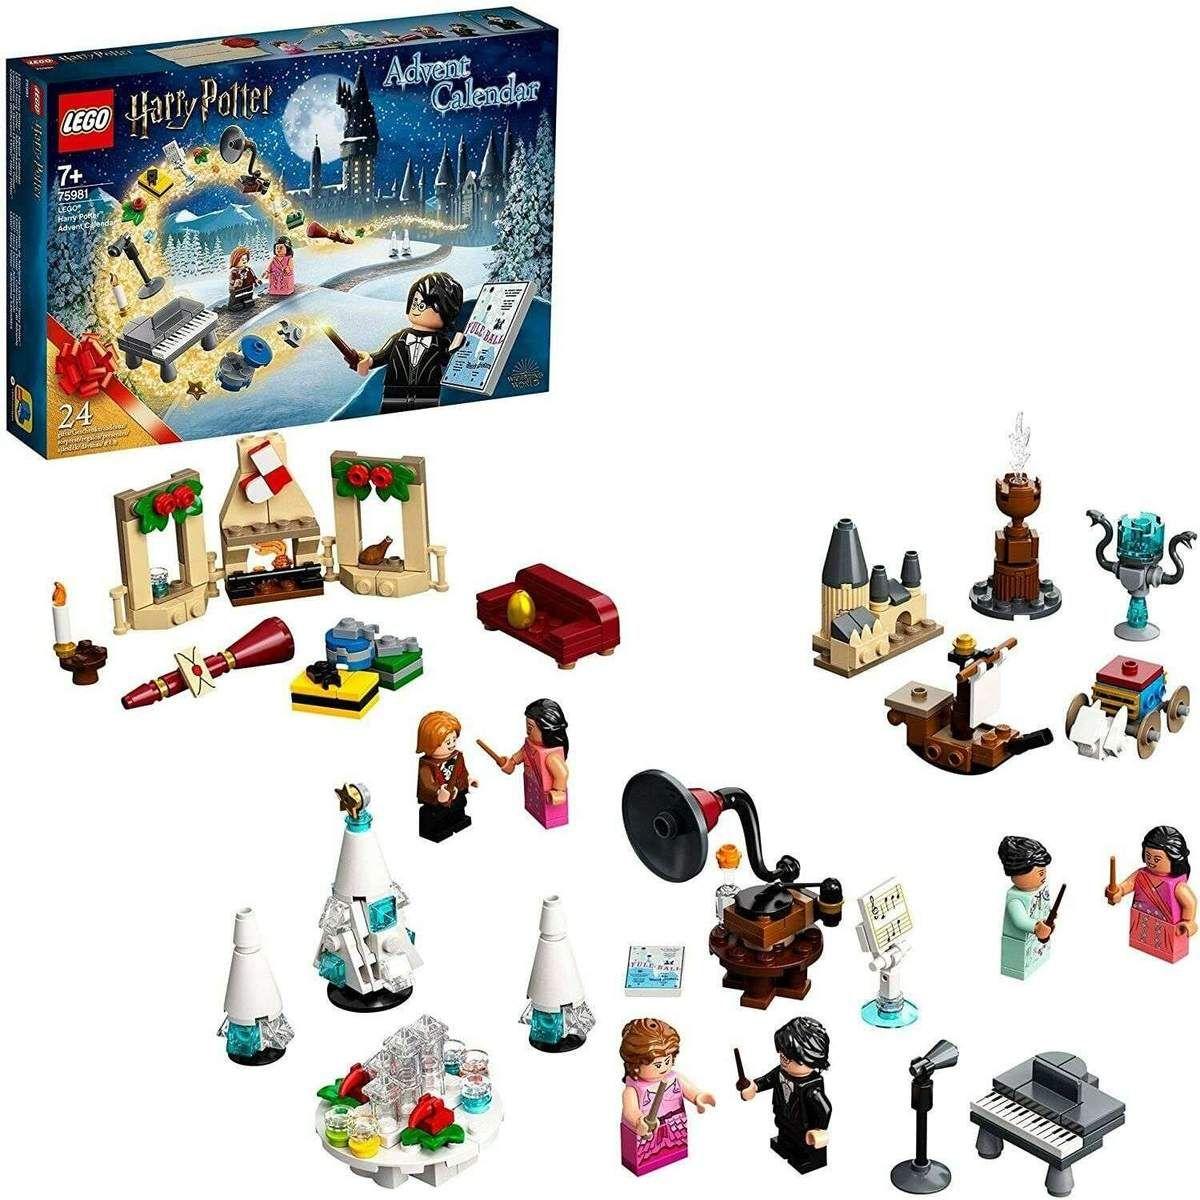 Neu Eingetroffen Lego Harry Potter 75981 Adventskalender Minifiguren Spielzeug Kinder Ab 7 Ja Adventskalender Kinder Kalender Fur Kinder Hogwarts Weihnachten